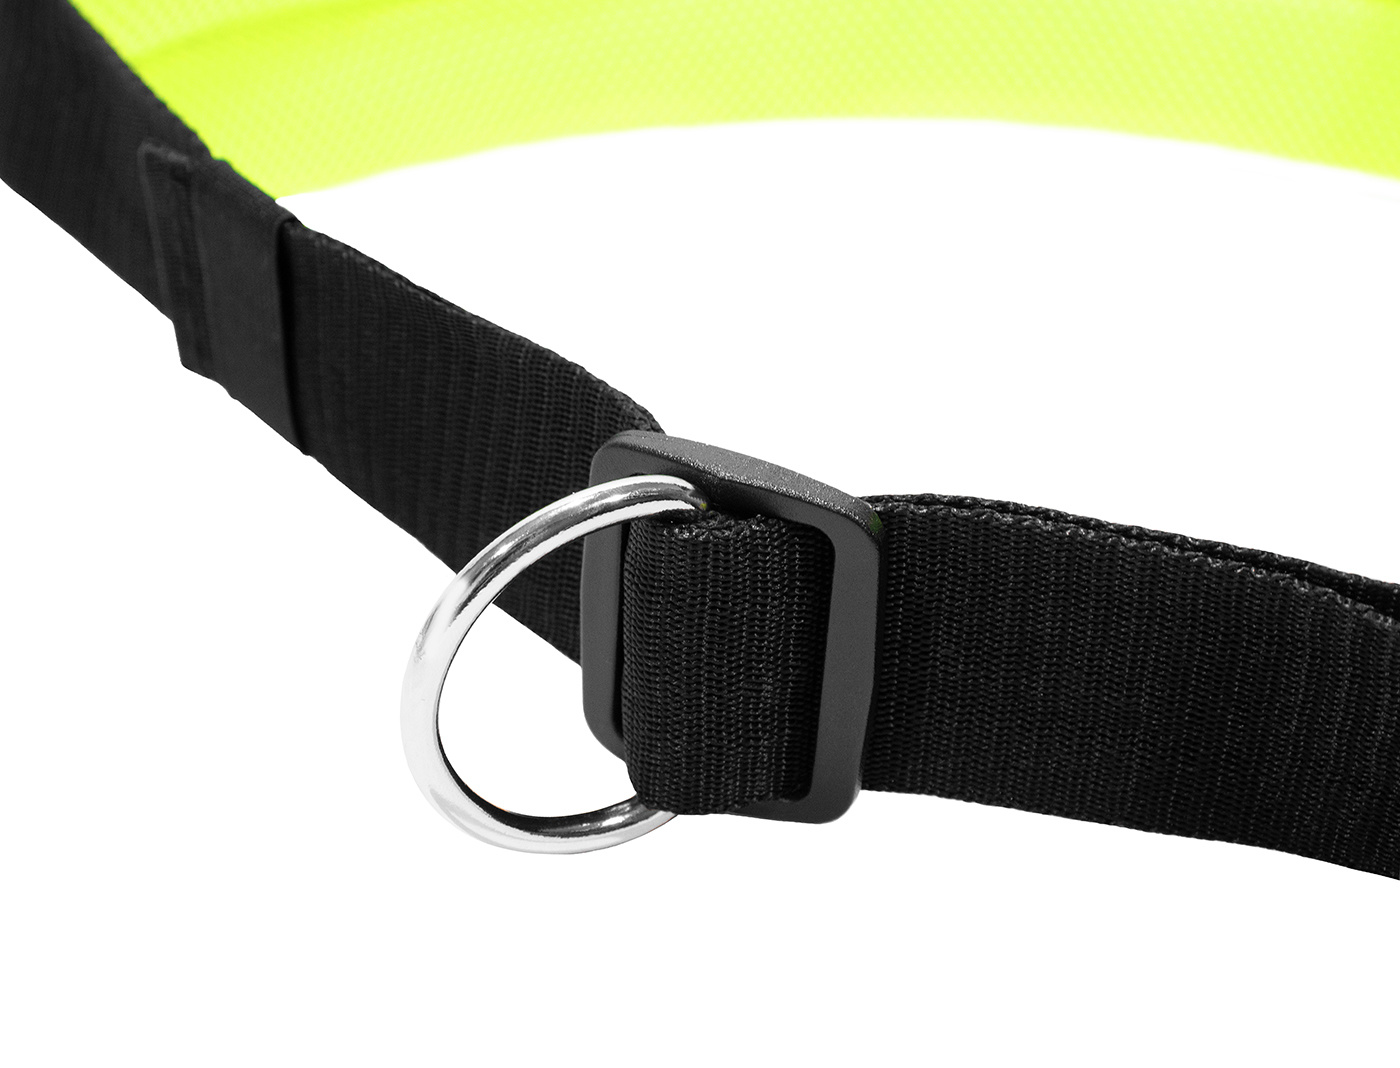 LasaLine Handsfree Dog Walking Running Jogging Waist Belt -  neon yellow Pedding/ black with reflectors